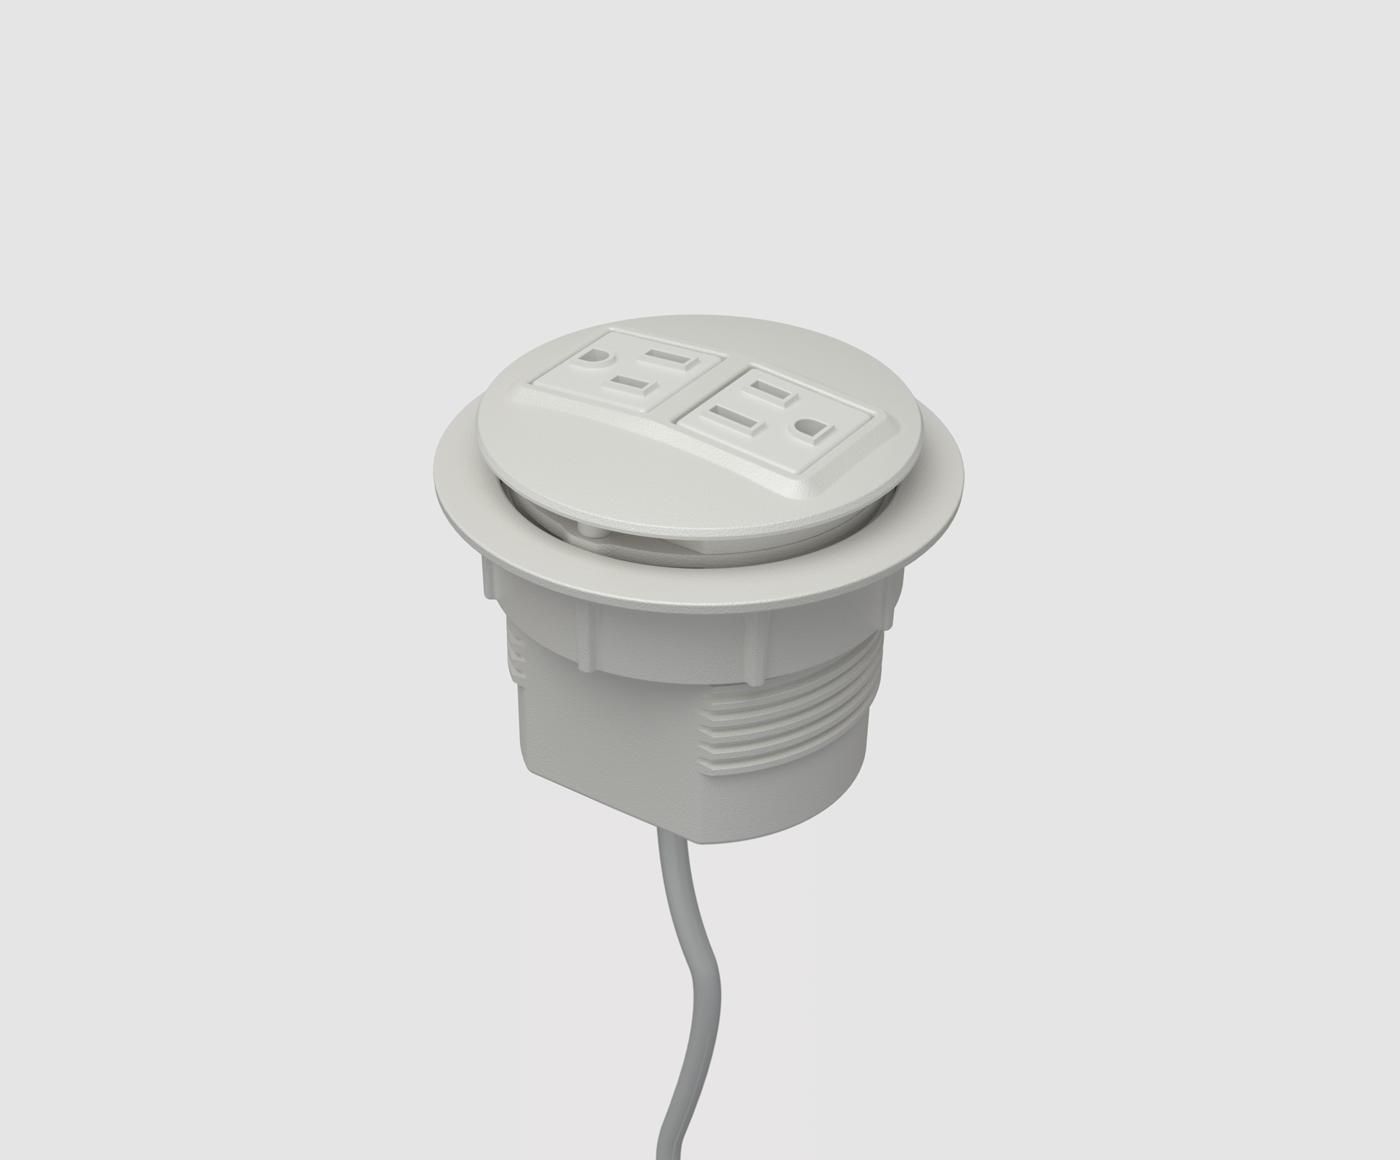 Desk Grommet Power Outlet